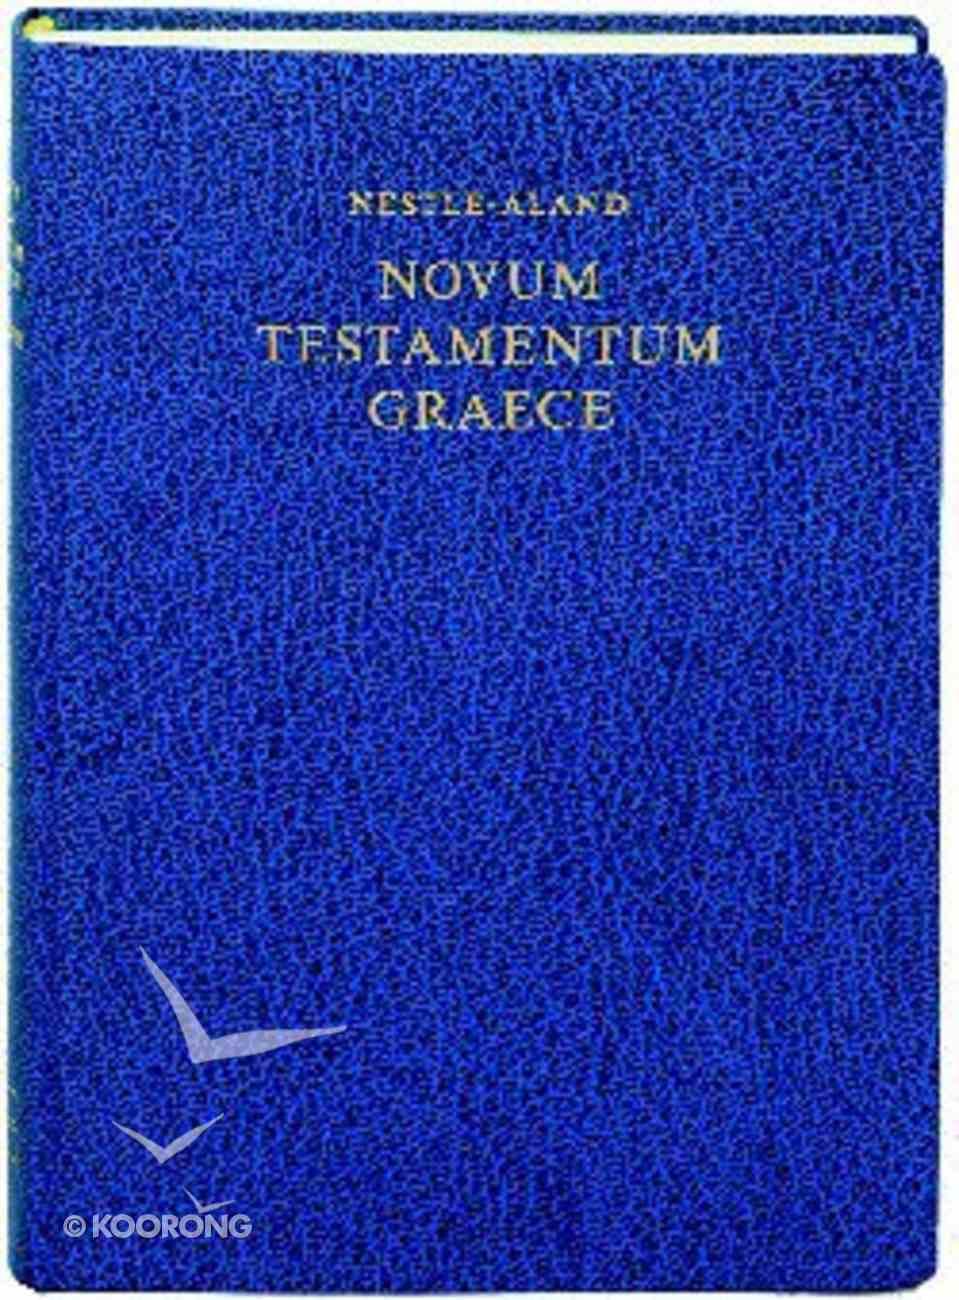 Greek New Testament Nestle-Aland 27Th Edition Blue Hardback